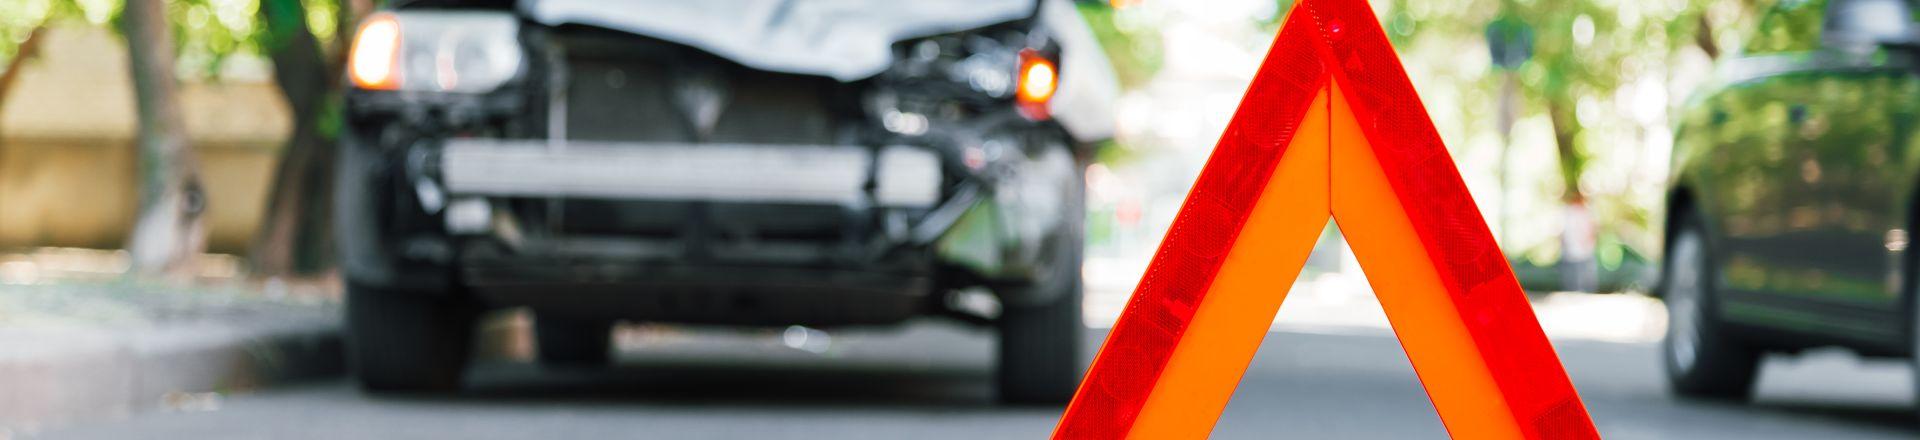 Broken gray Car During Road Traffic Accident